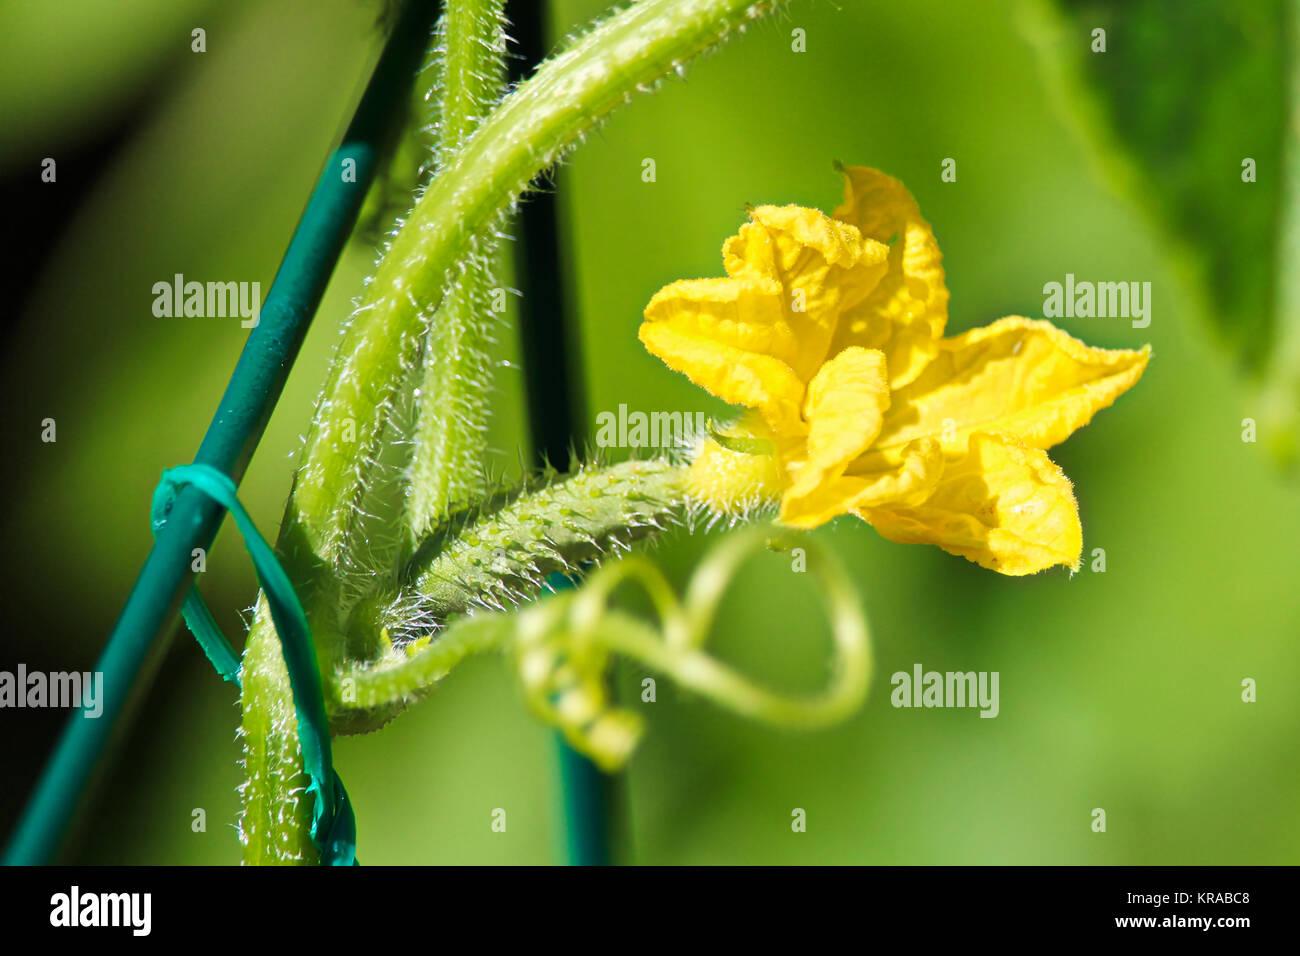 String Trellis Stockfotos & String Trellis Bilder - Alamy